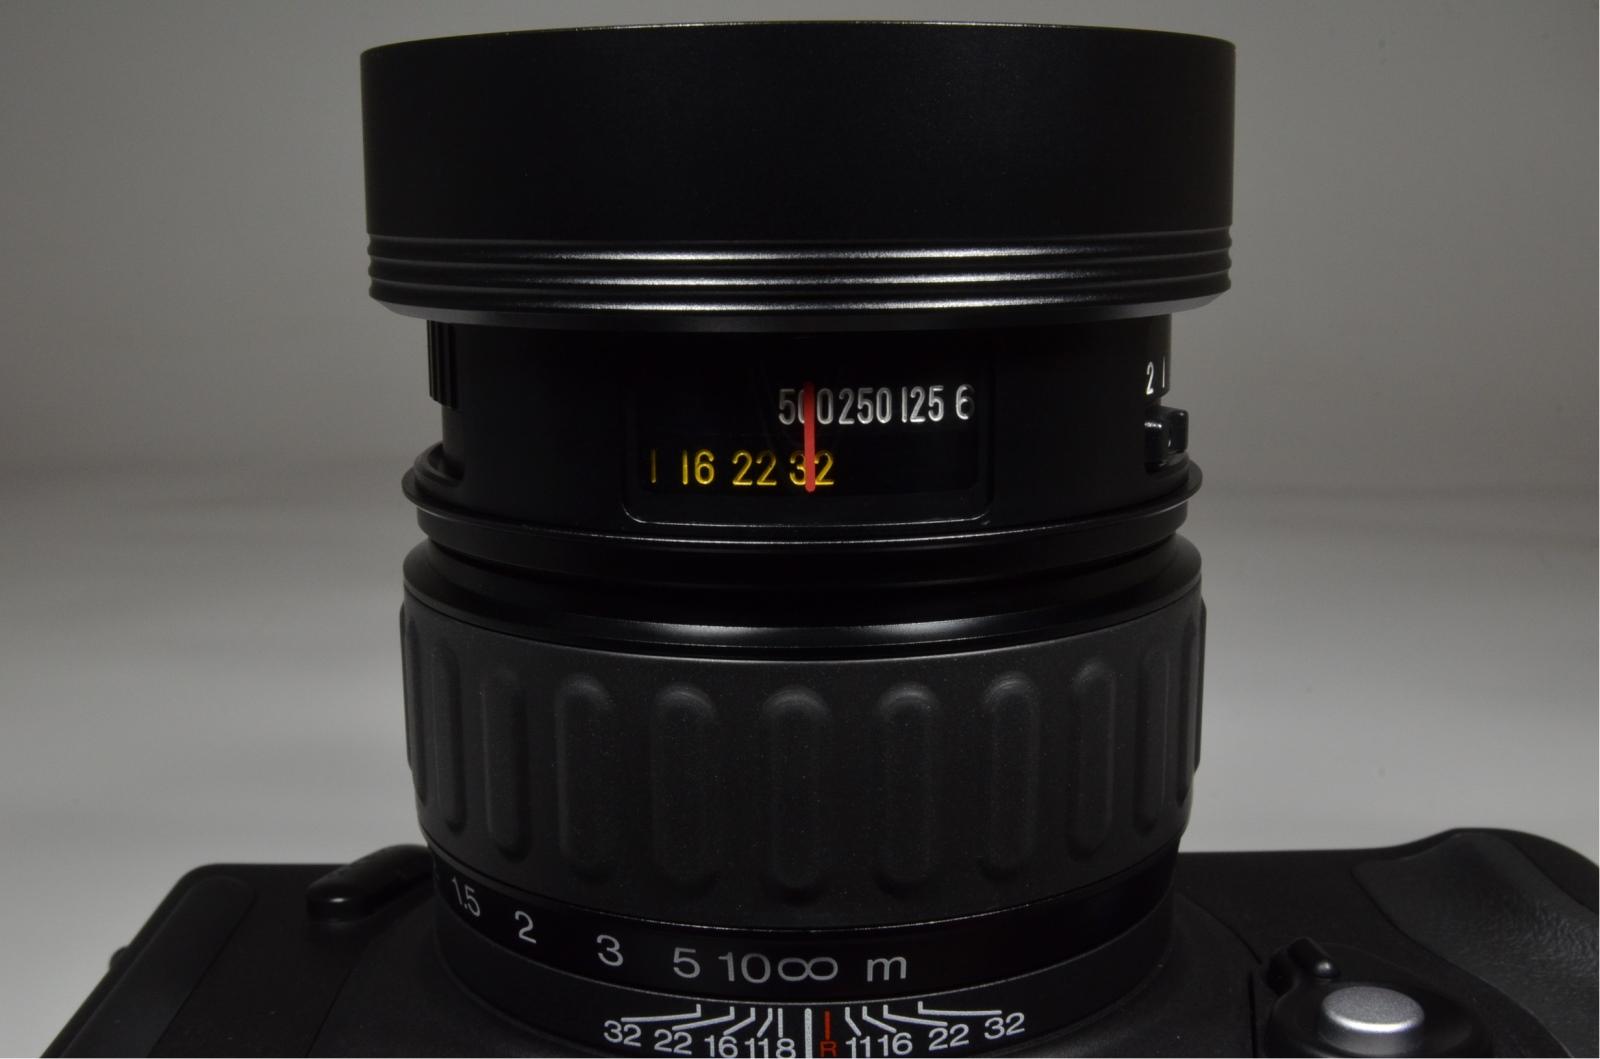 fuji fujifilm gw690iii professional ebc 90mm f3.5